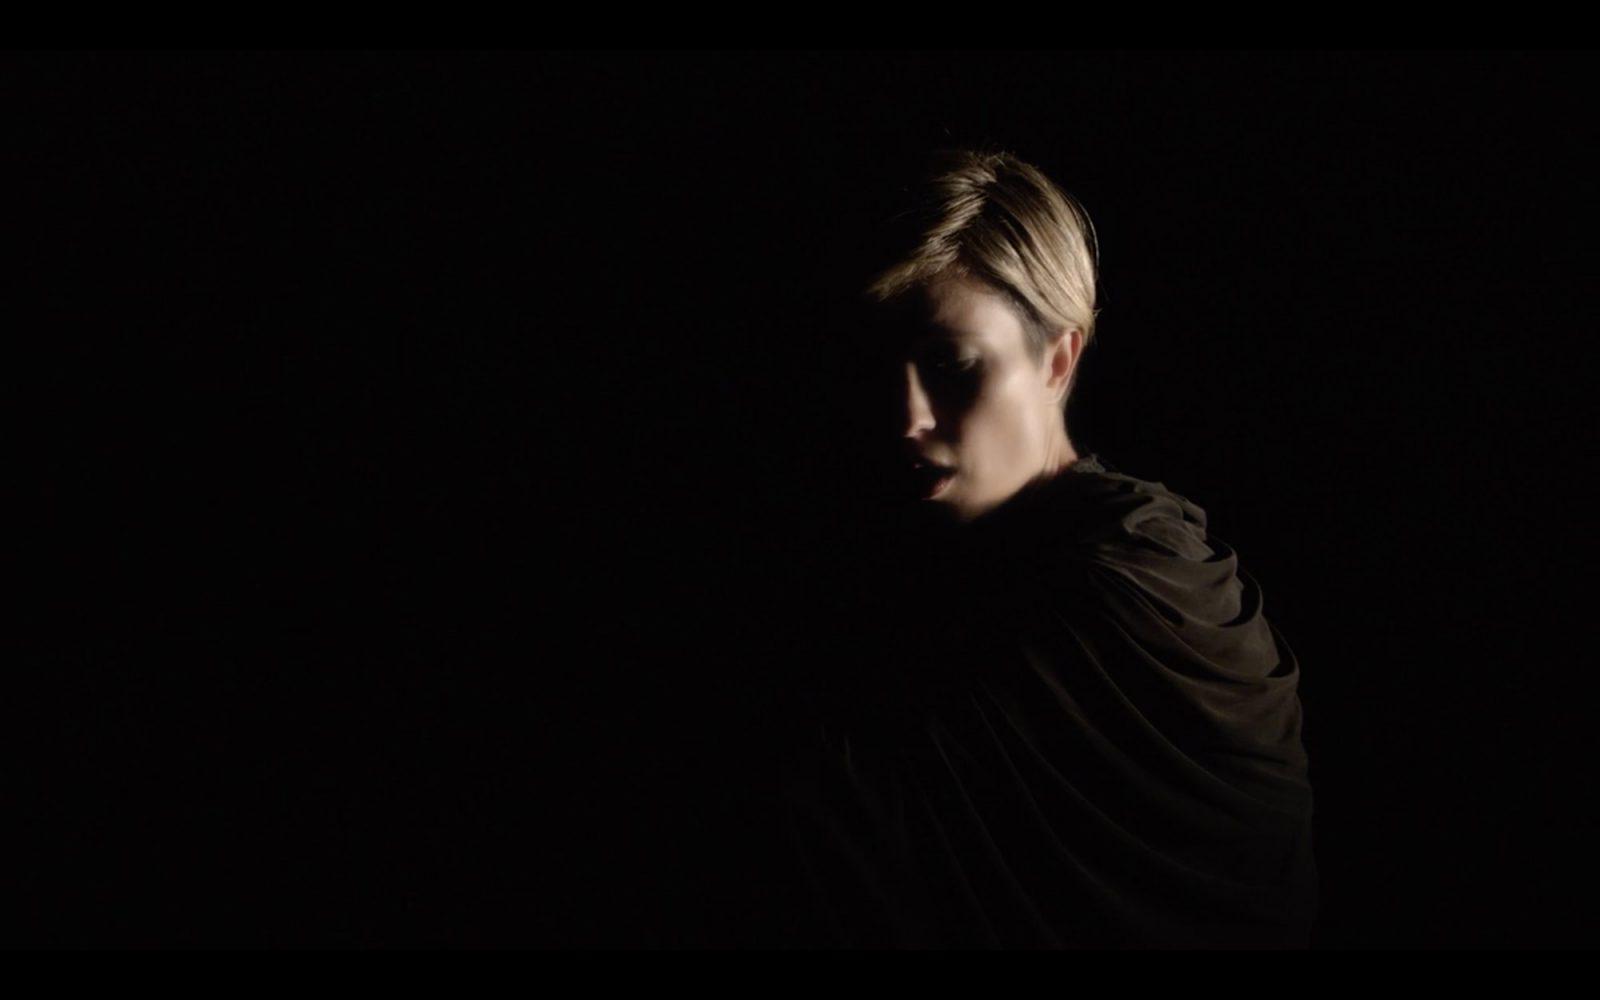 MUSICVID_Missy-Higgins-'Unashamed-Desire_01